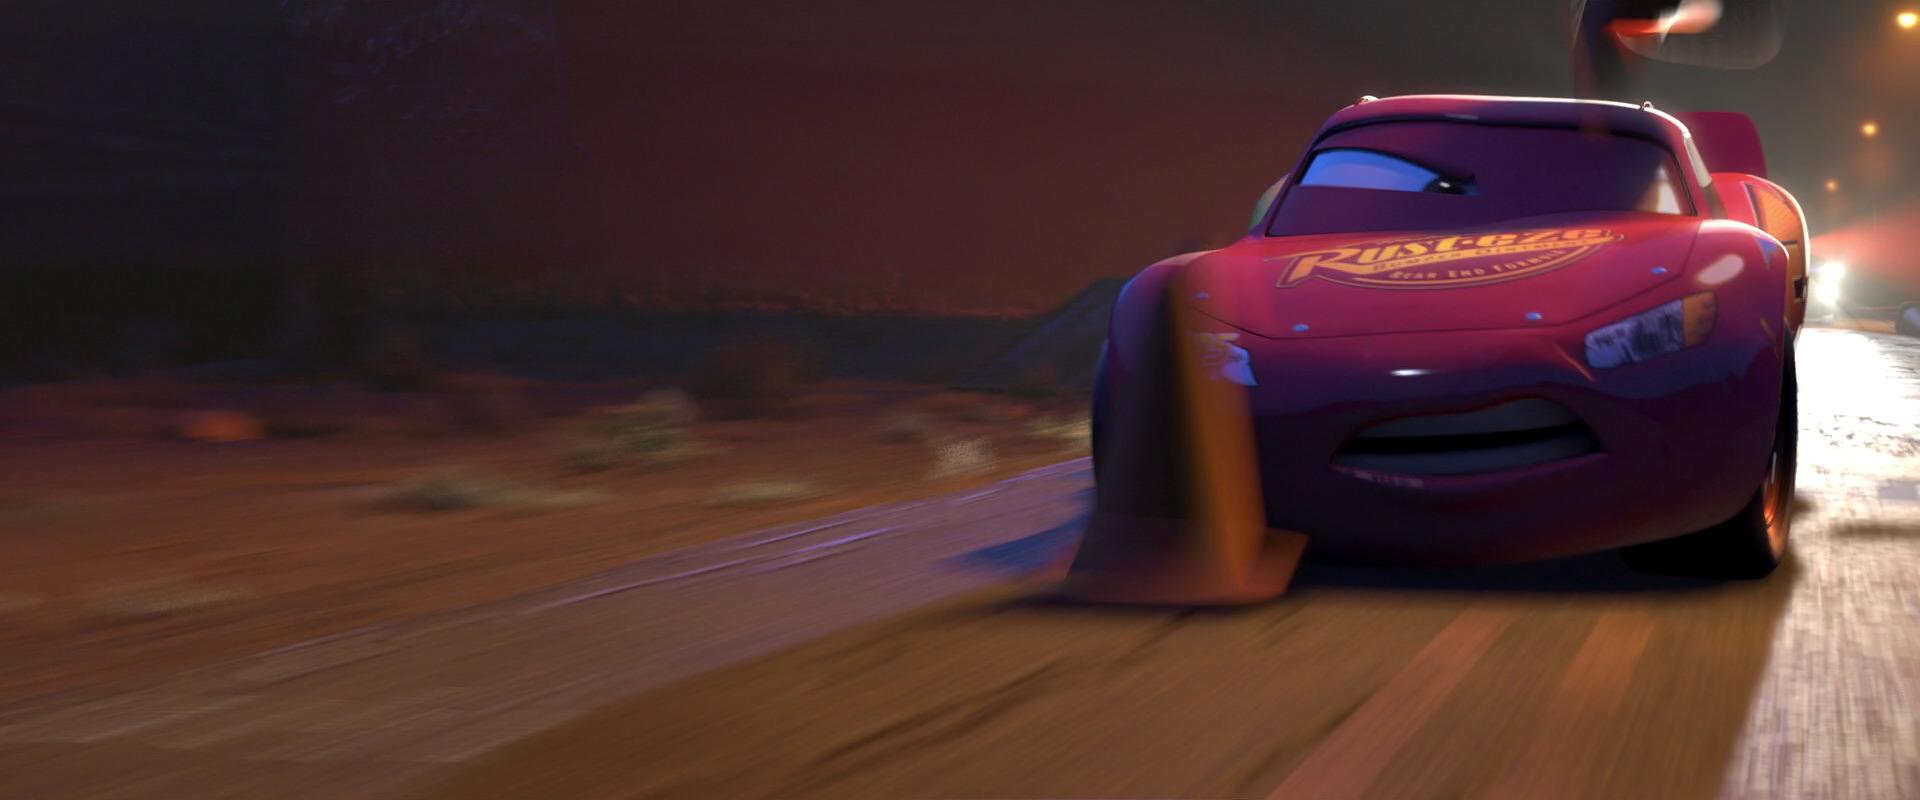 Disney Cars 1 Lightning Mcqueen Bed And Breakfast